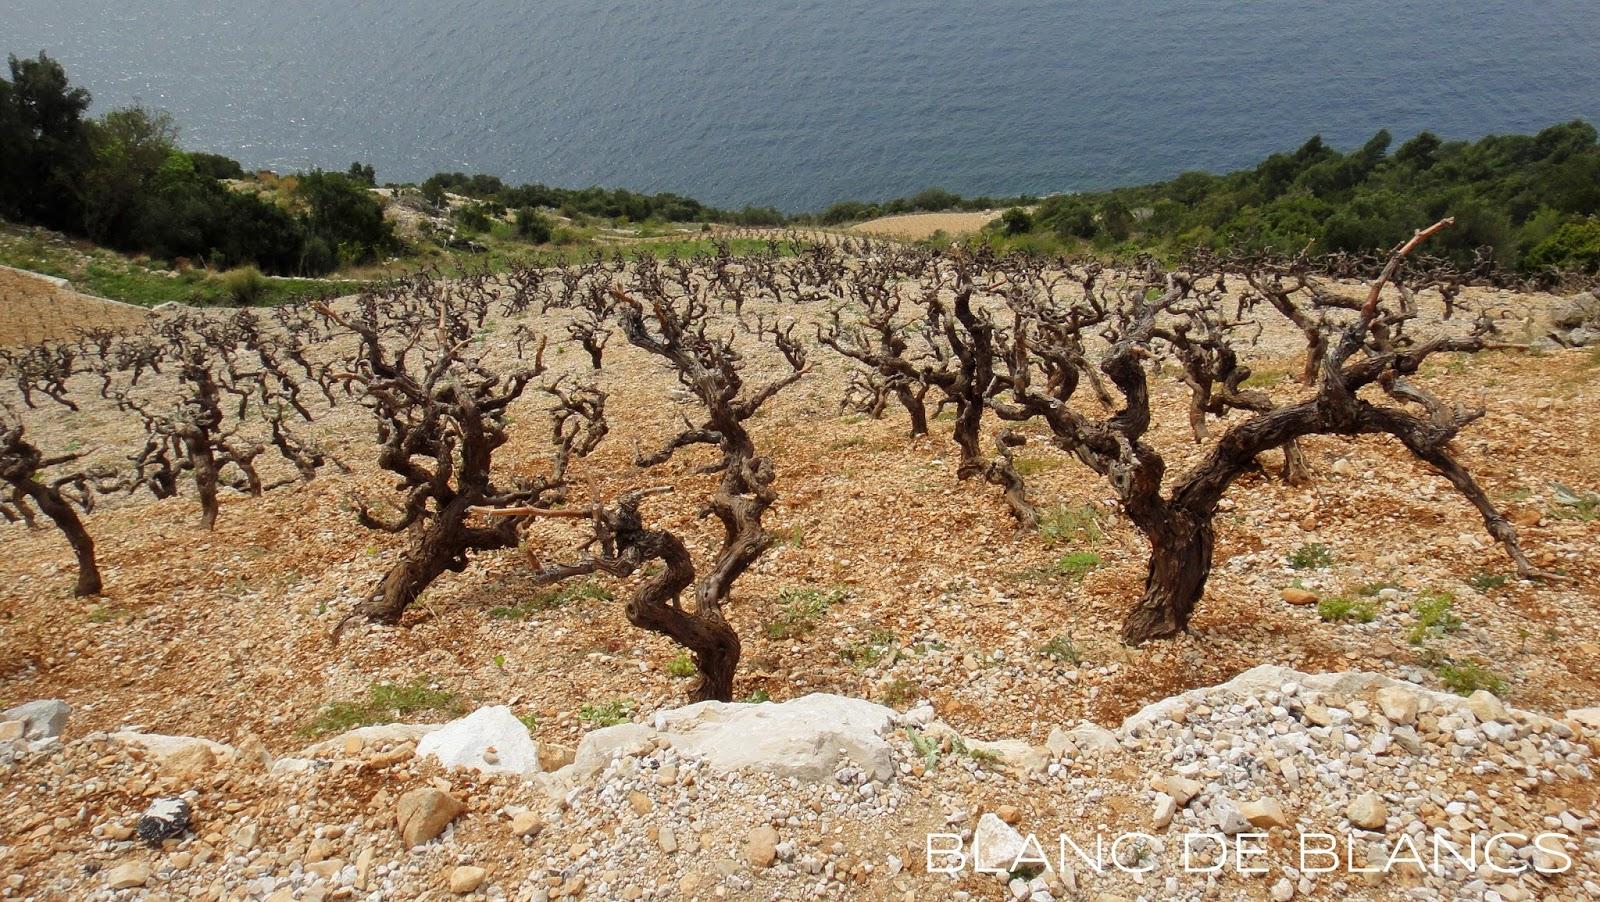 Istria, Peljesac peninsula - www.blancdeblancs.fi